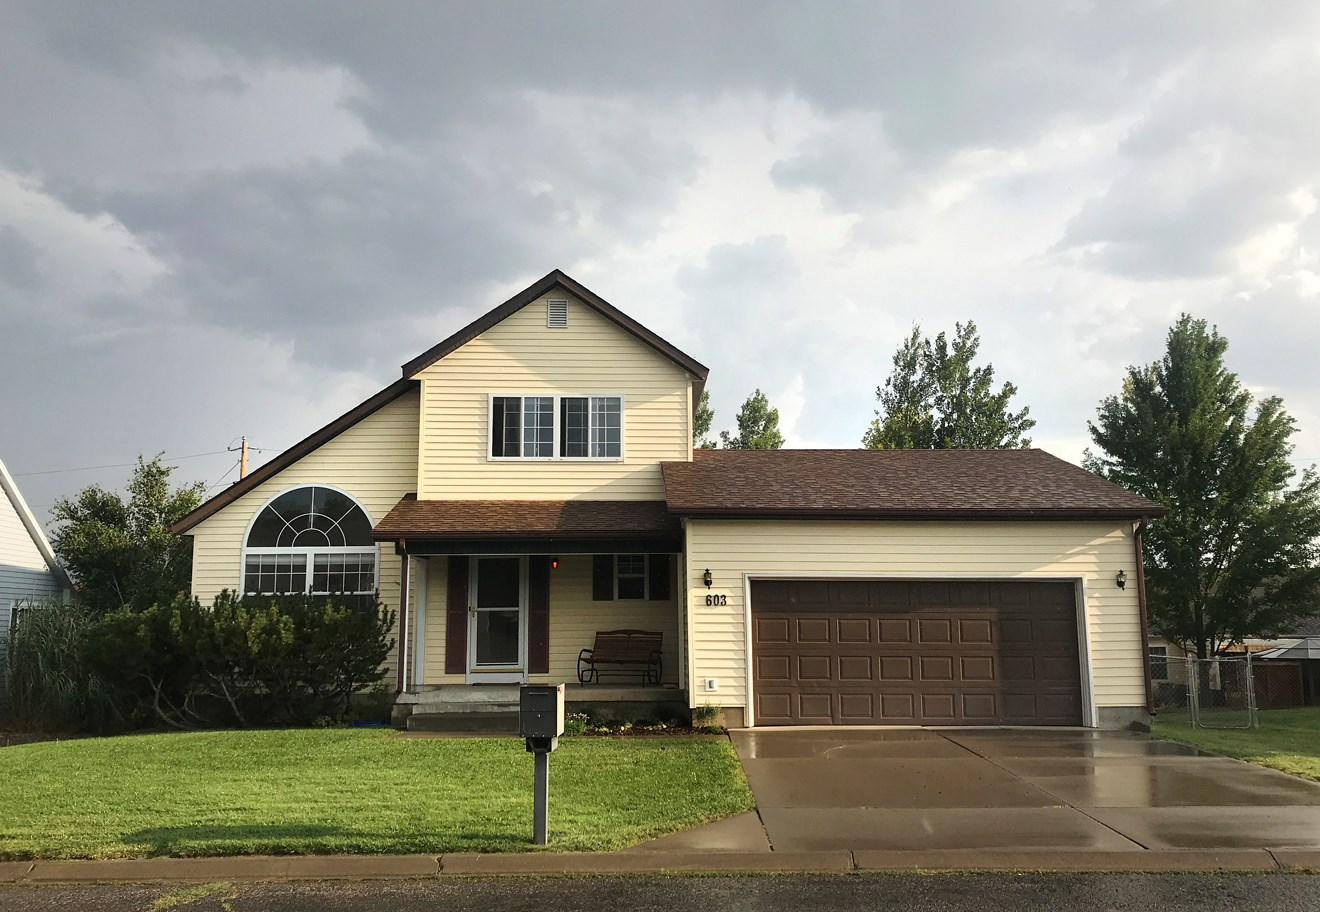 4 BR/4 BA home in desirable neighborhood in Cortez, CO